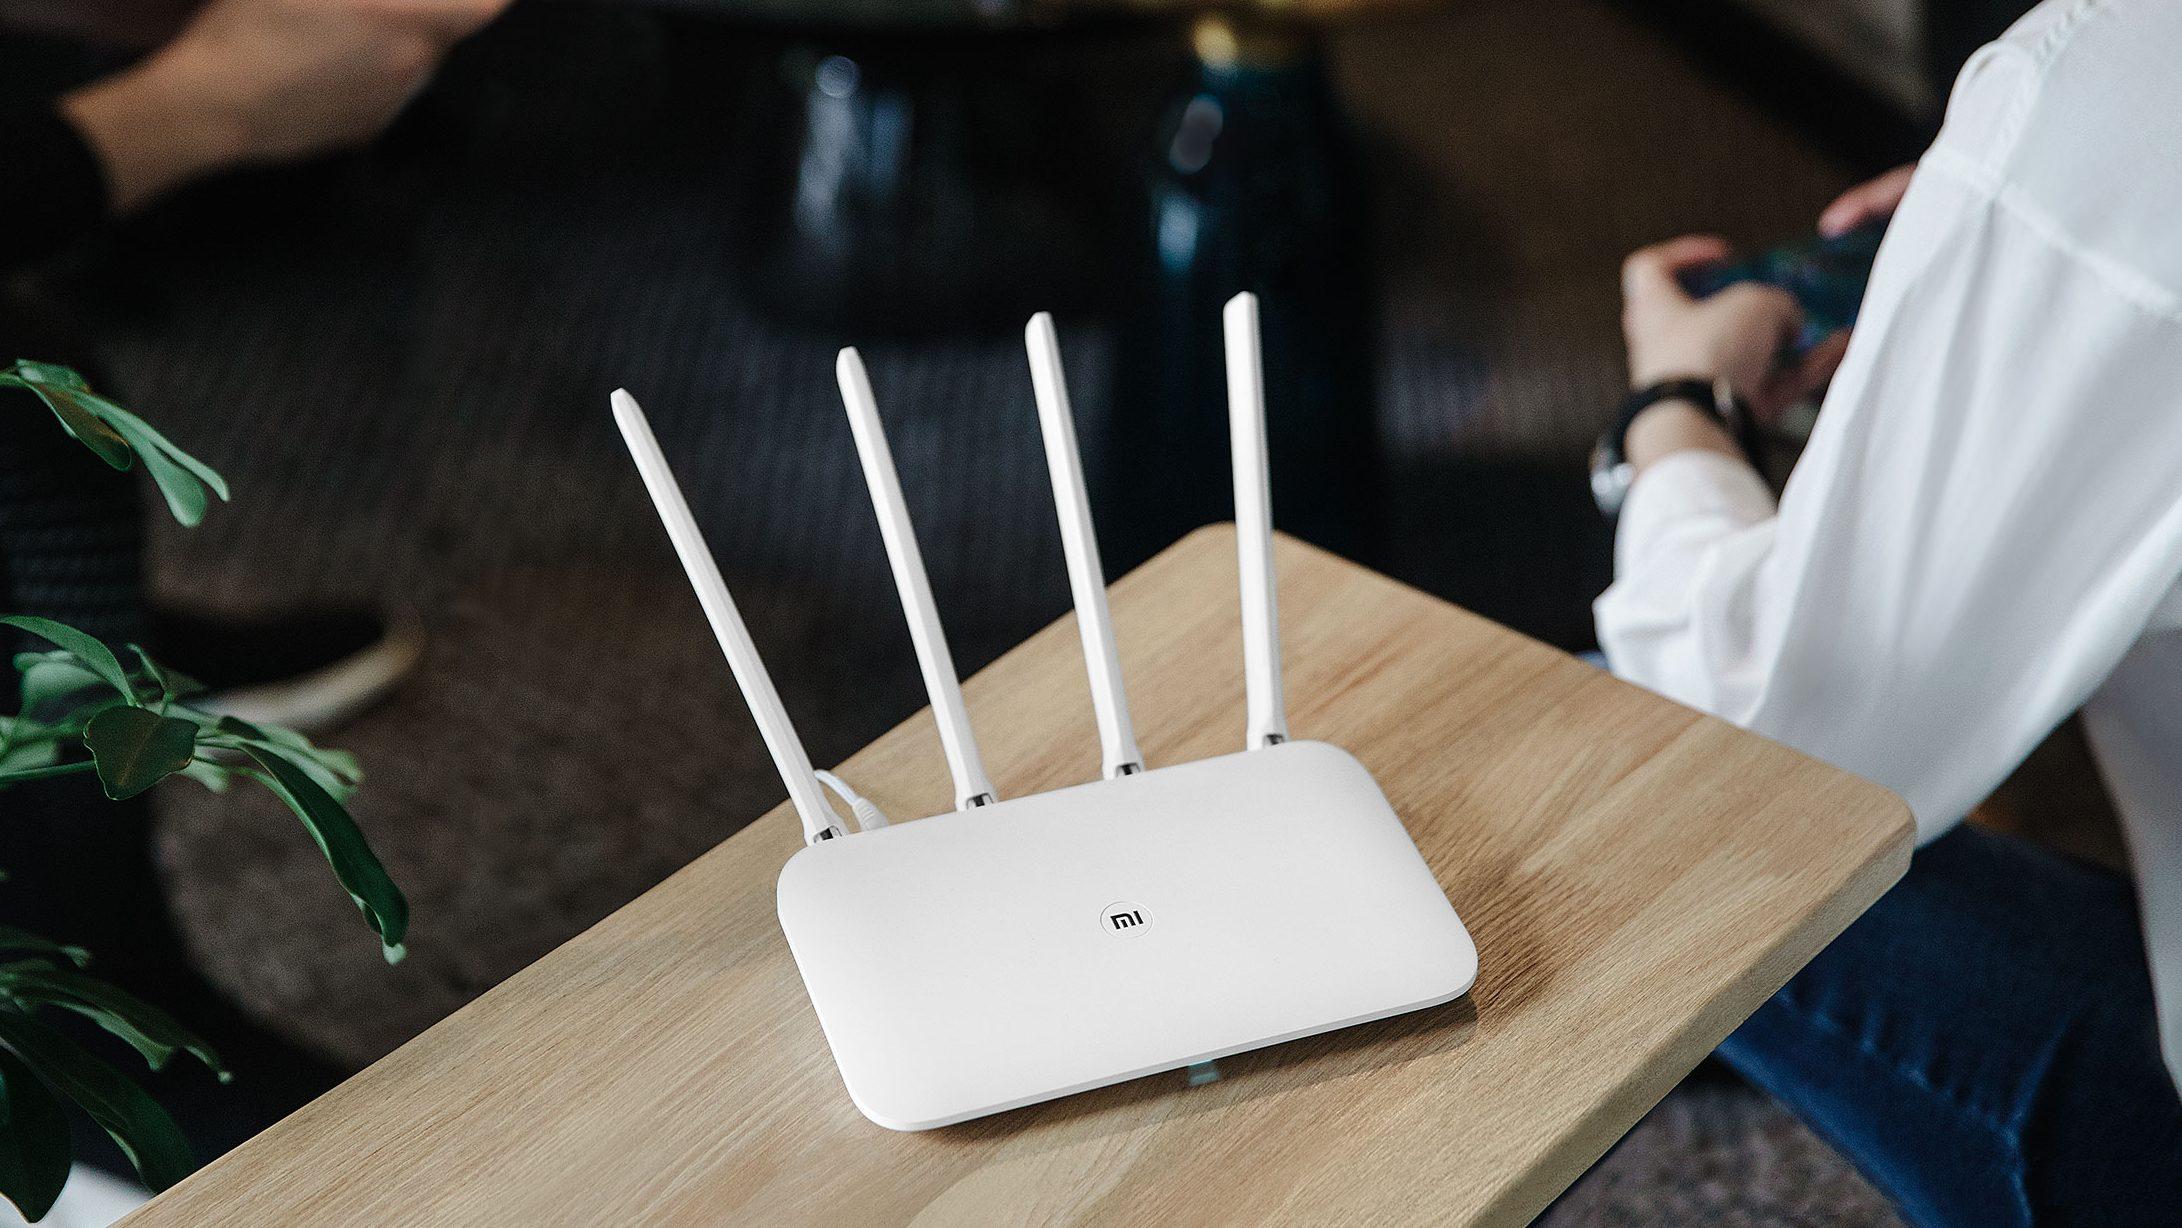 роутер wifi и много устройств